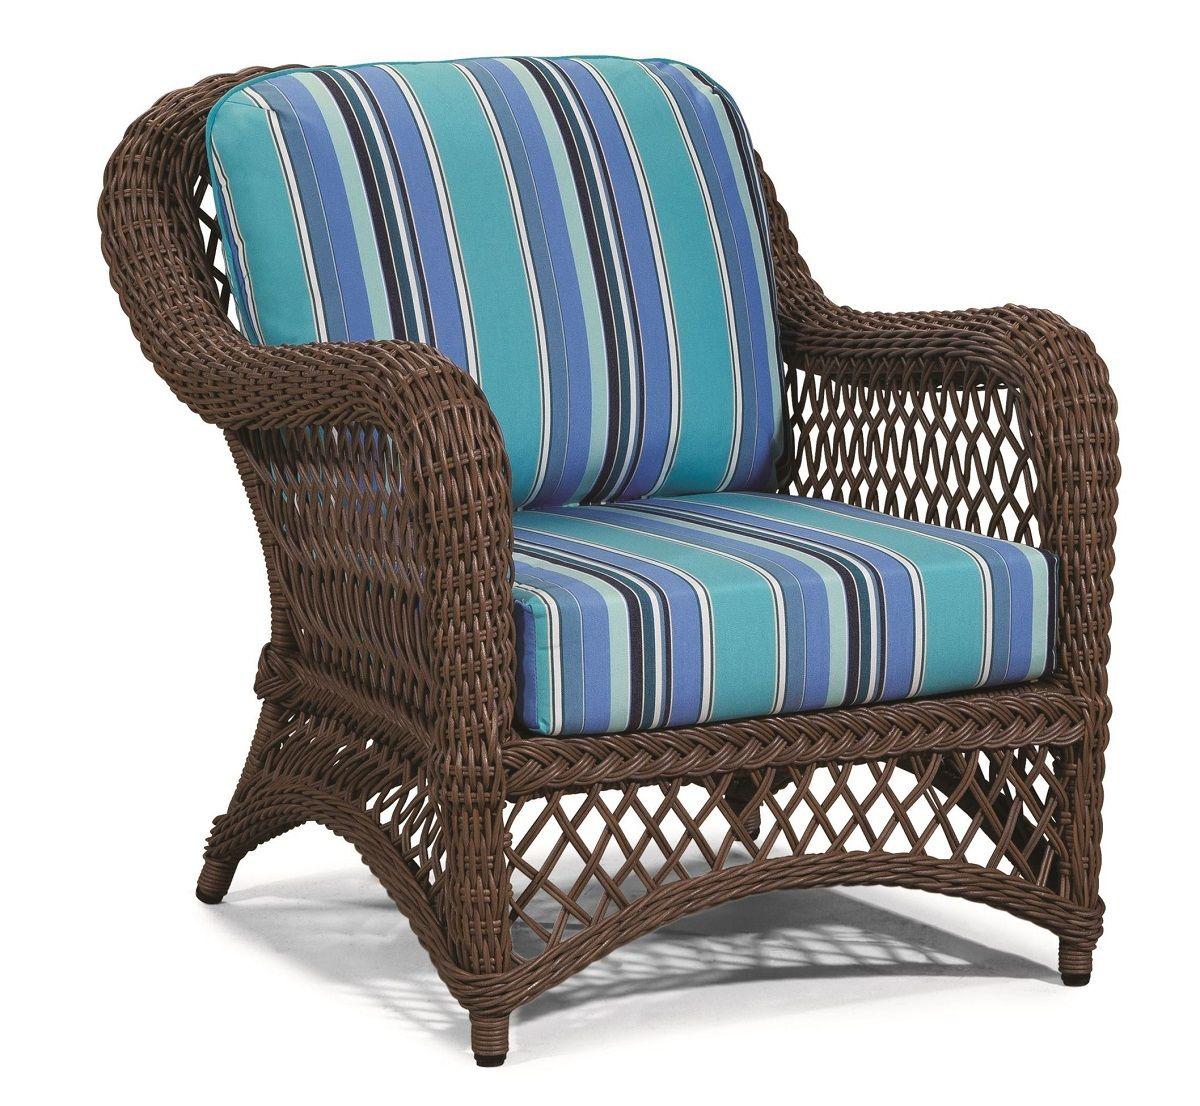 Outdoor Wicker Chair Savannah Outdoor Wicker Chairs Wicker